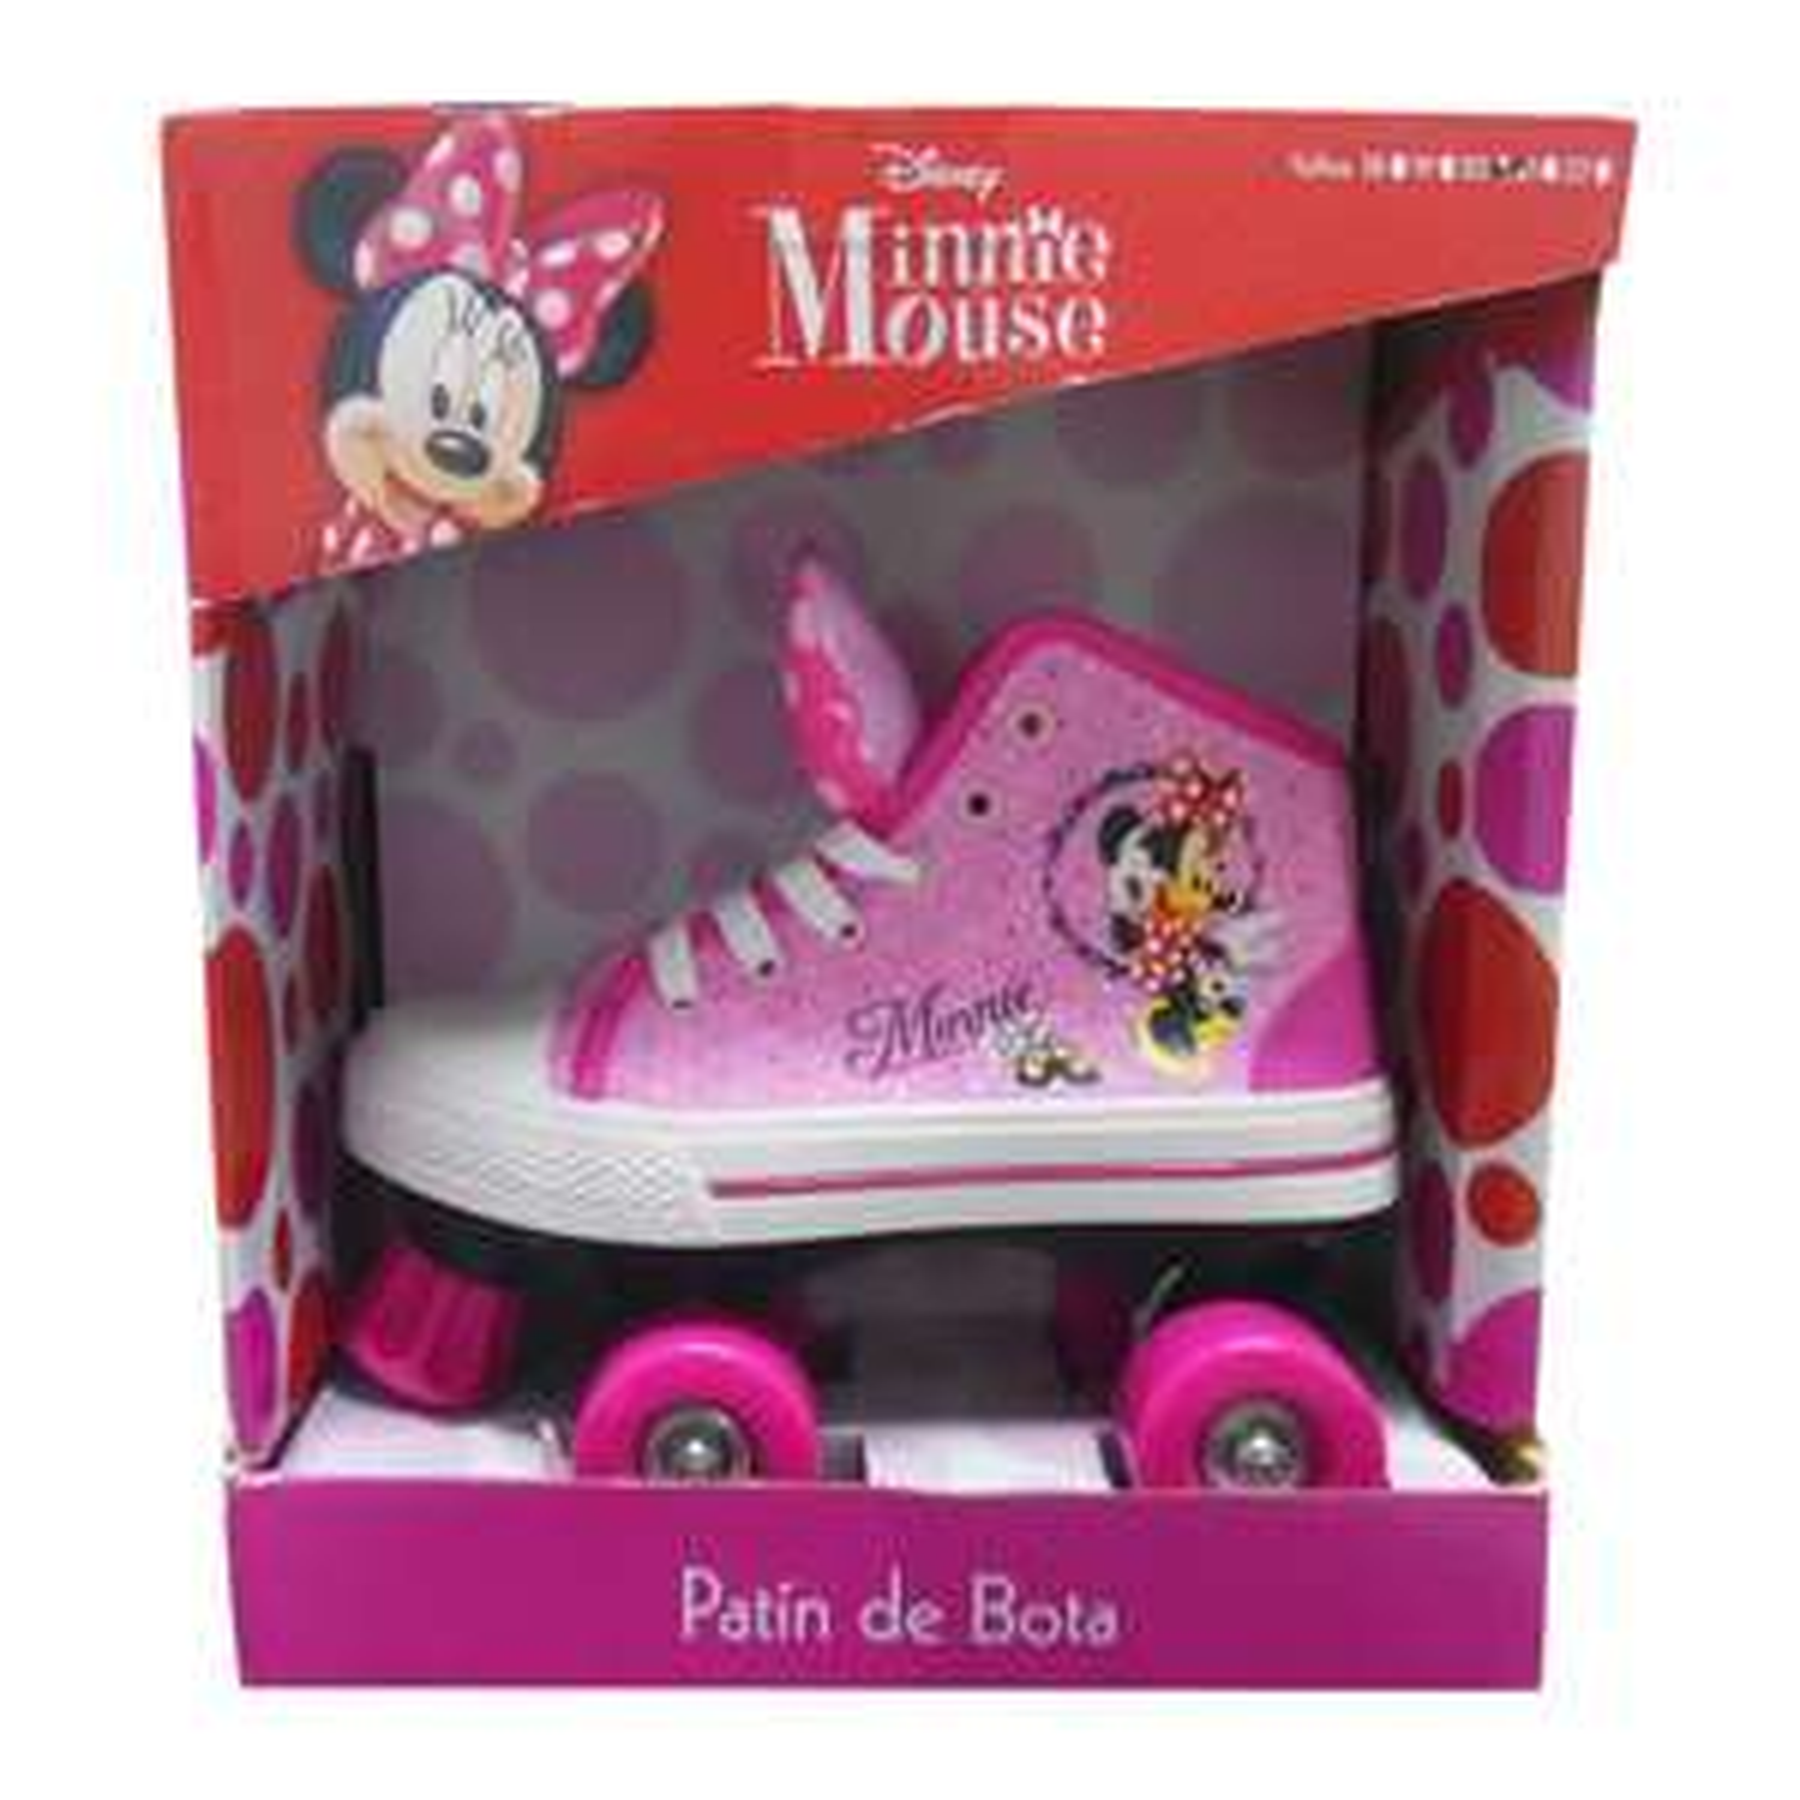 Palacio de hierro: Patines 4 ruedas para niña Minnie